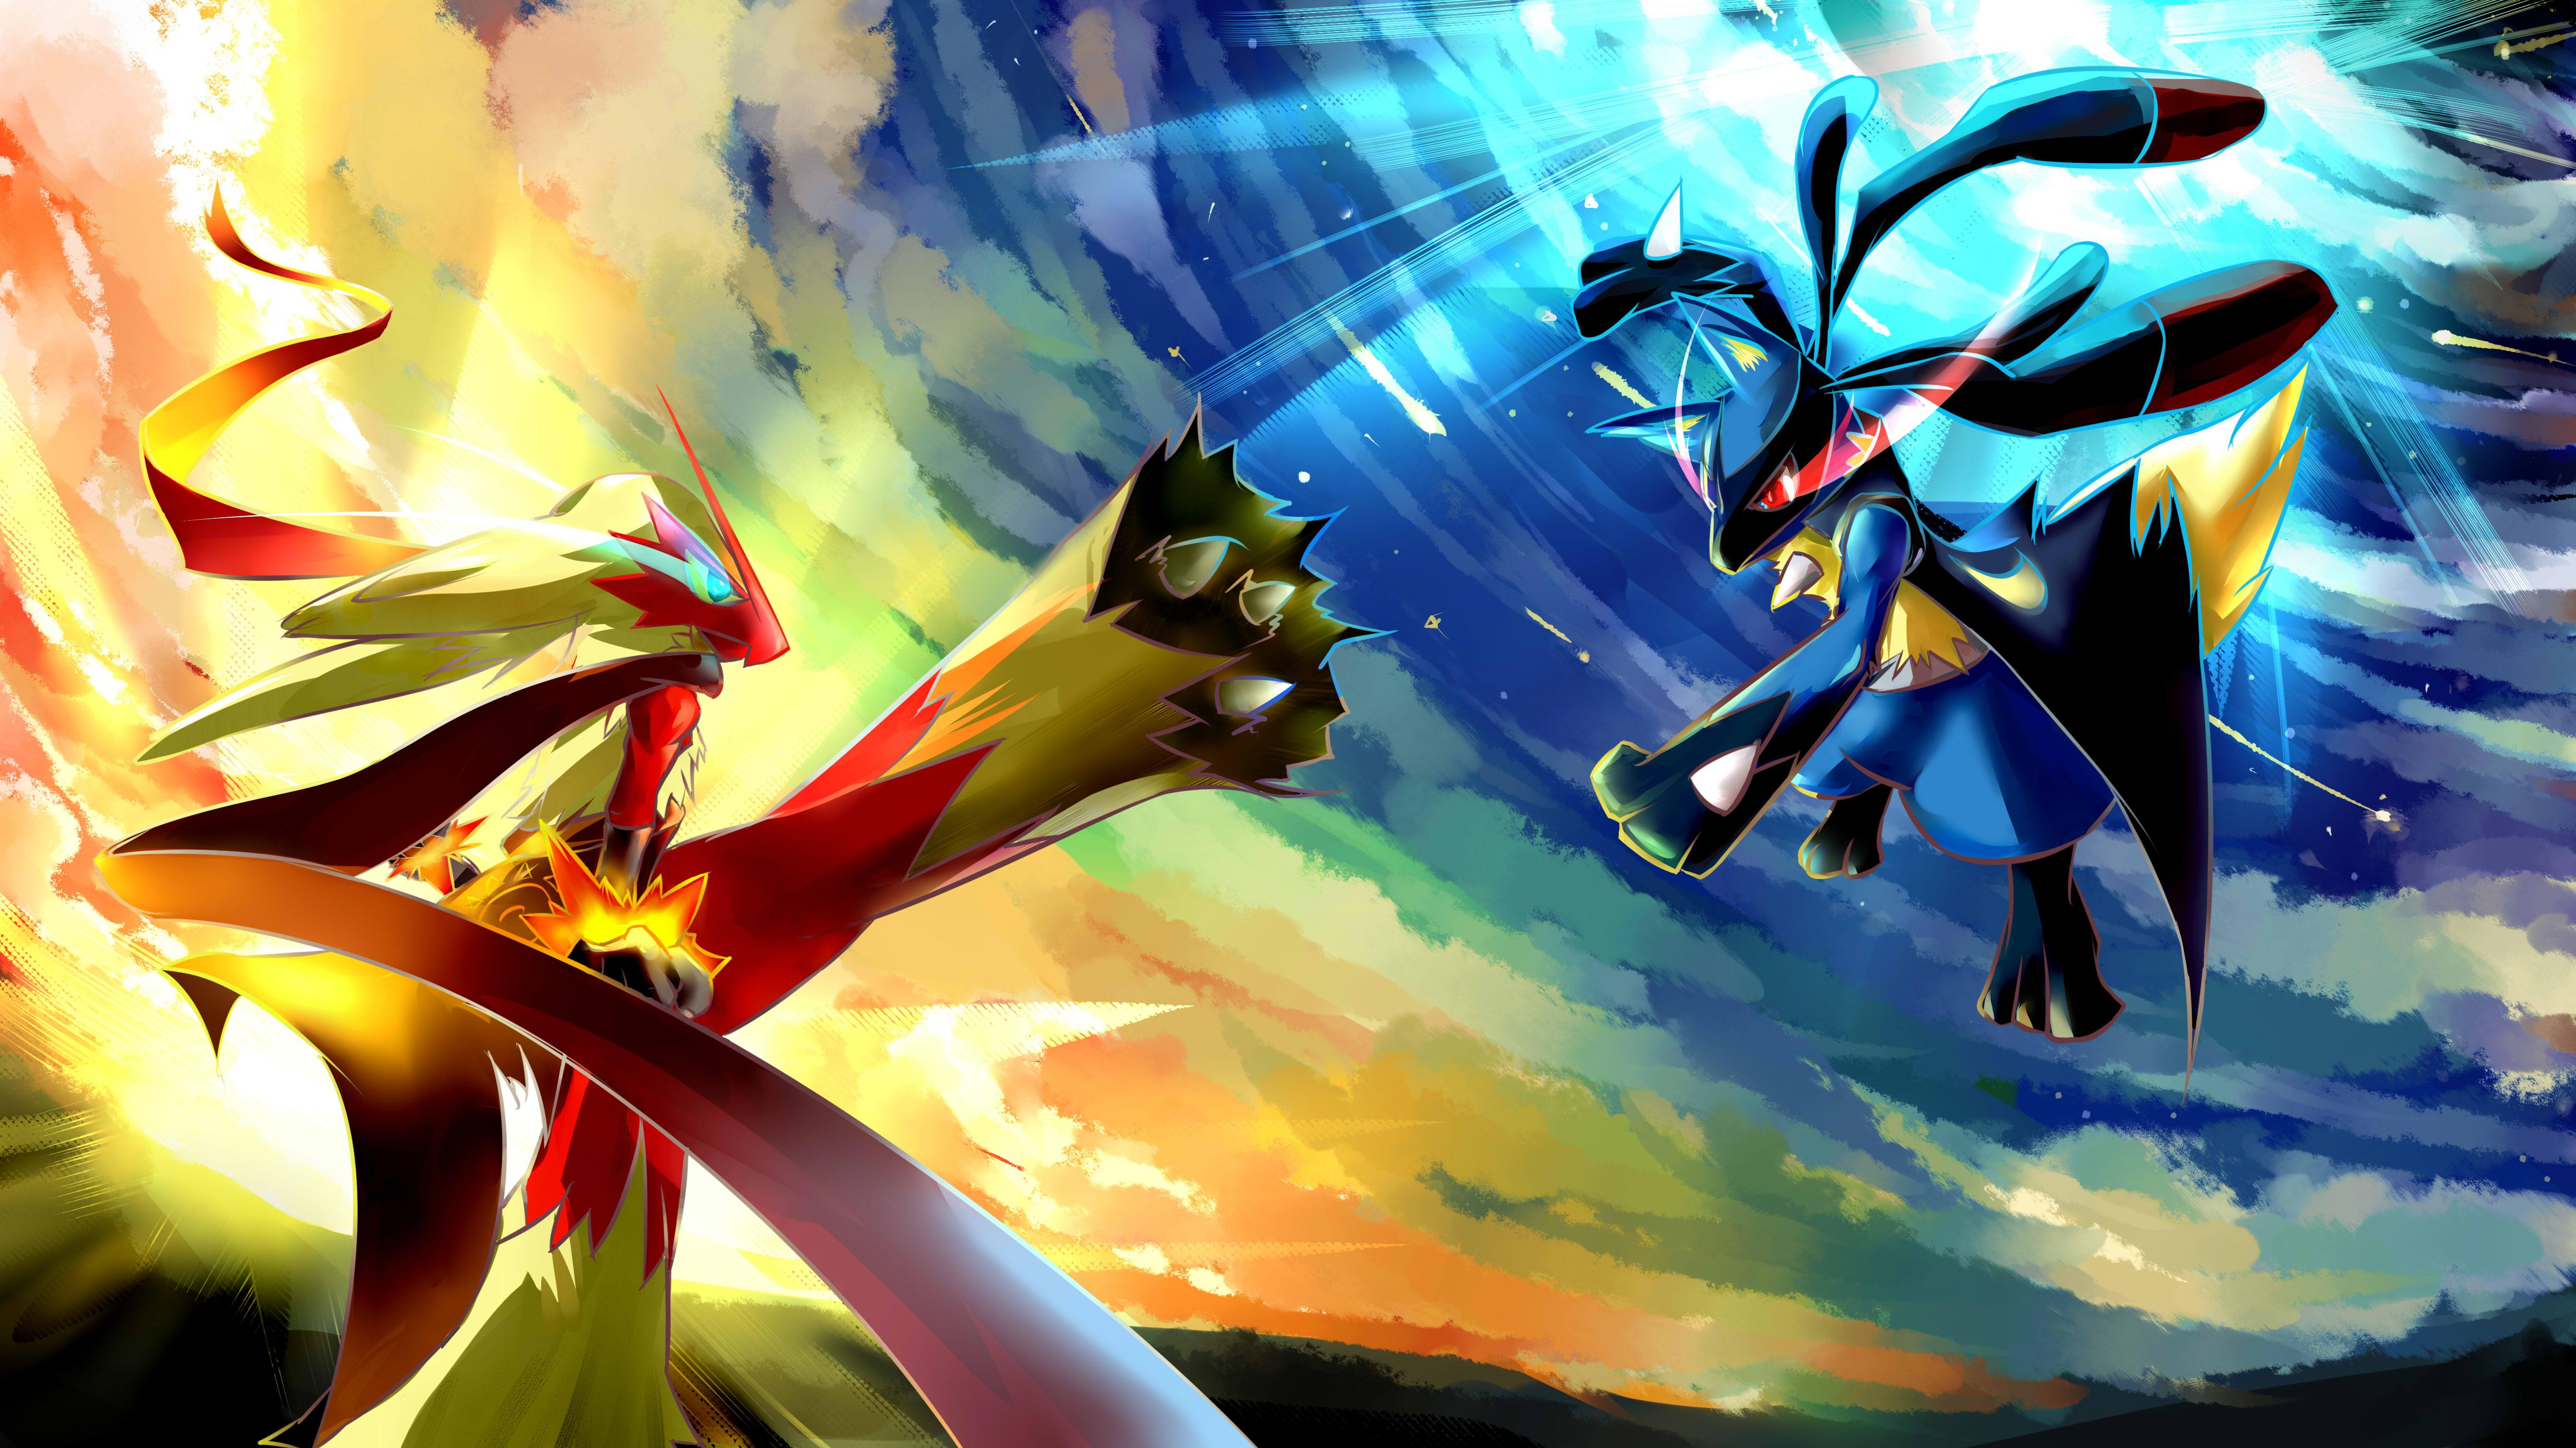 digital hd pokemon image